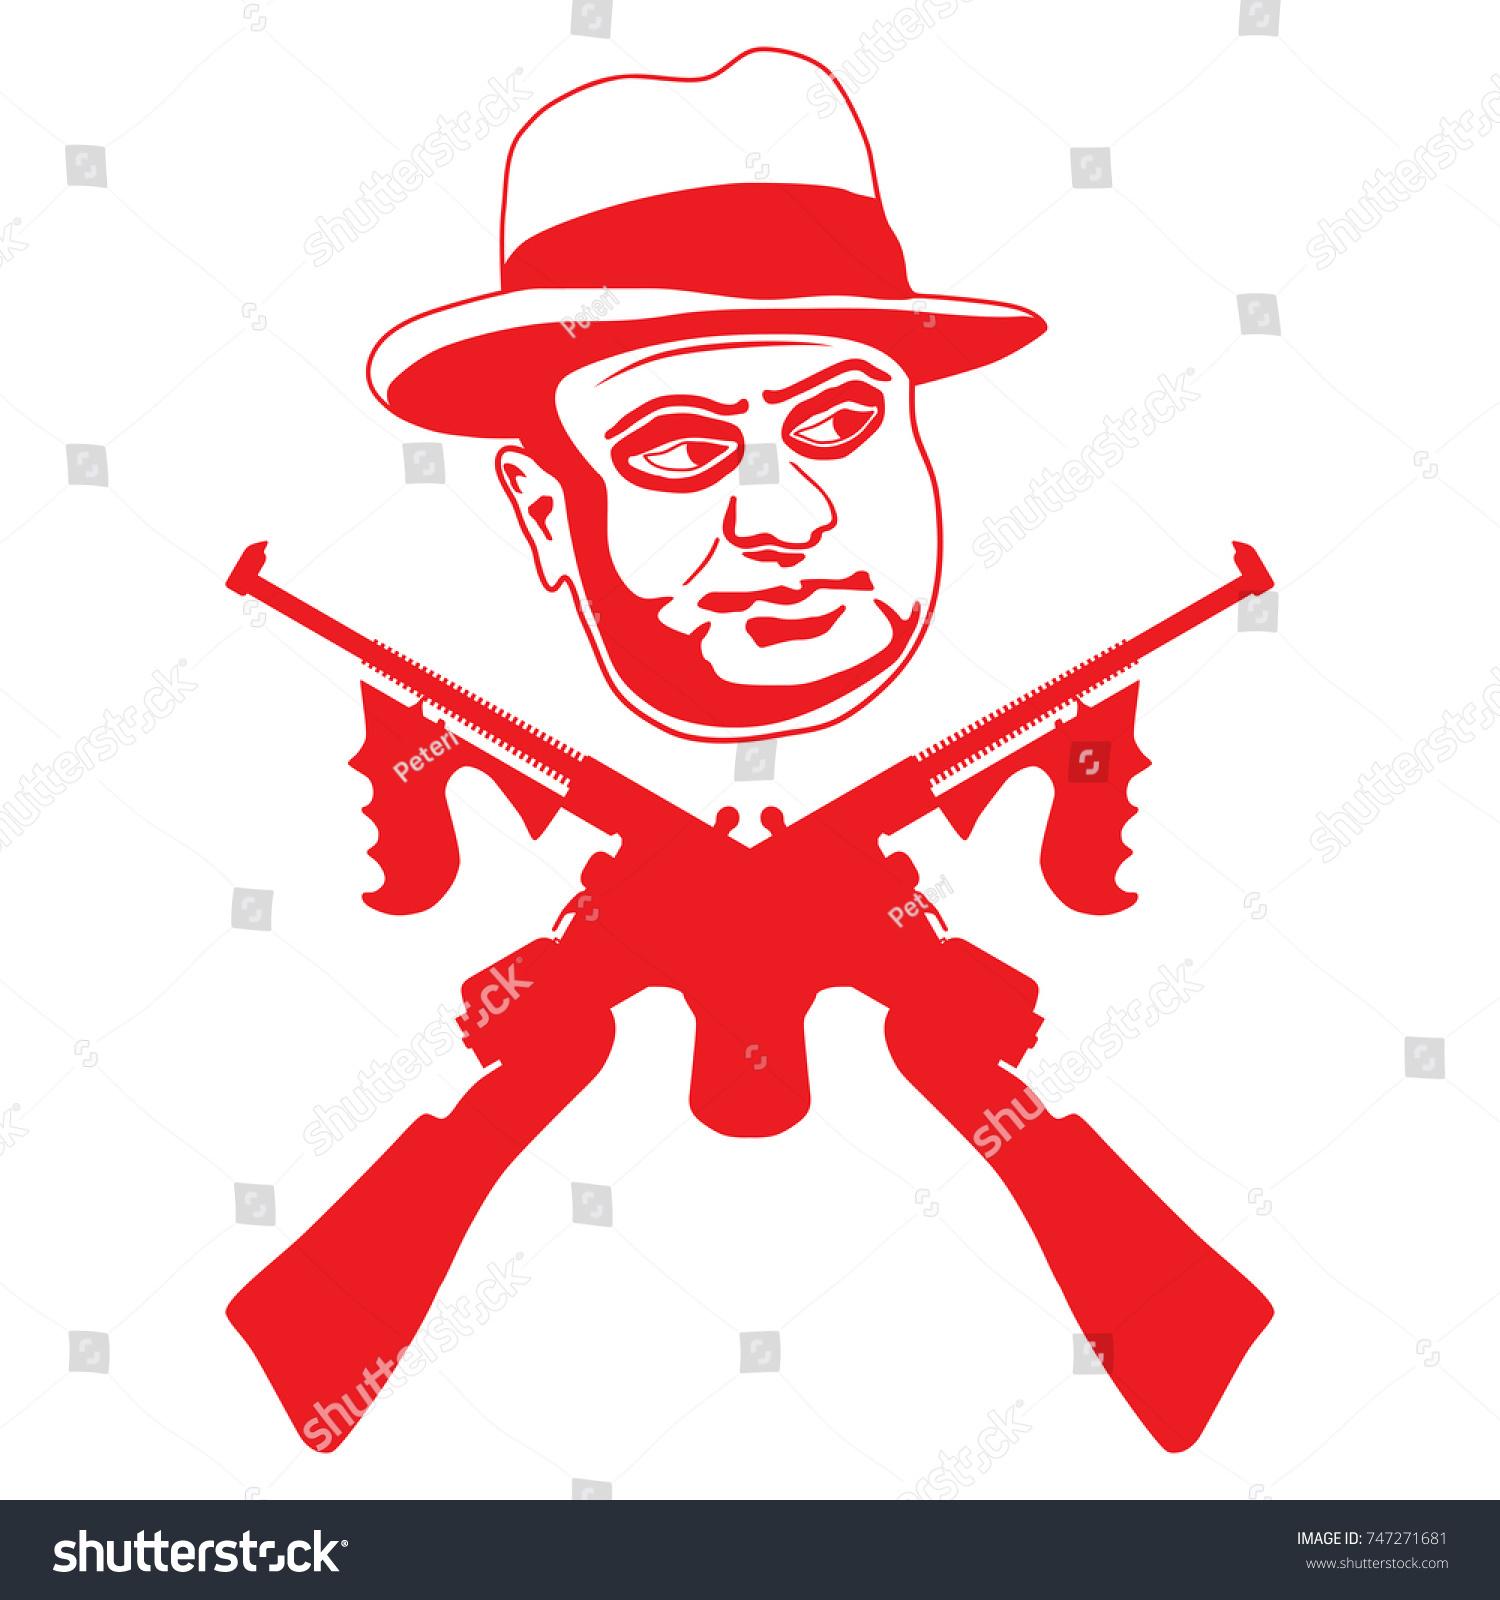 Mafia boss two crossed submachine guns stock vector 747271681 mafia boss with two crossed submachine guns symbol of violence and crime concept flat buycottarizona Choice Image